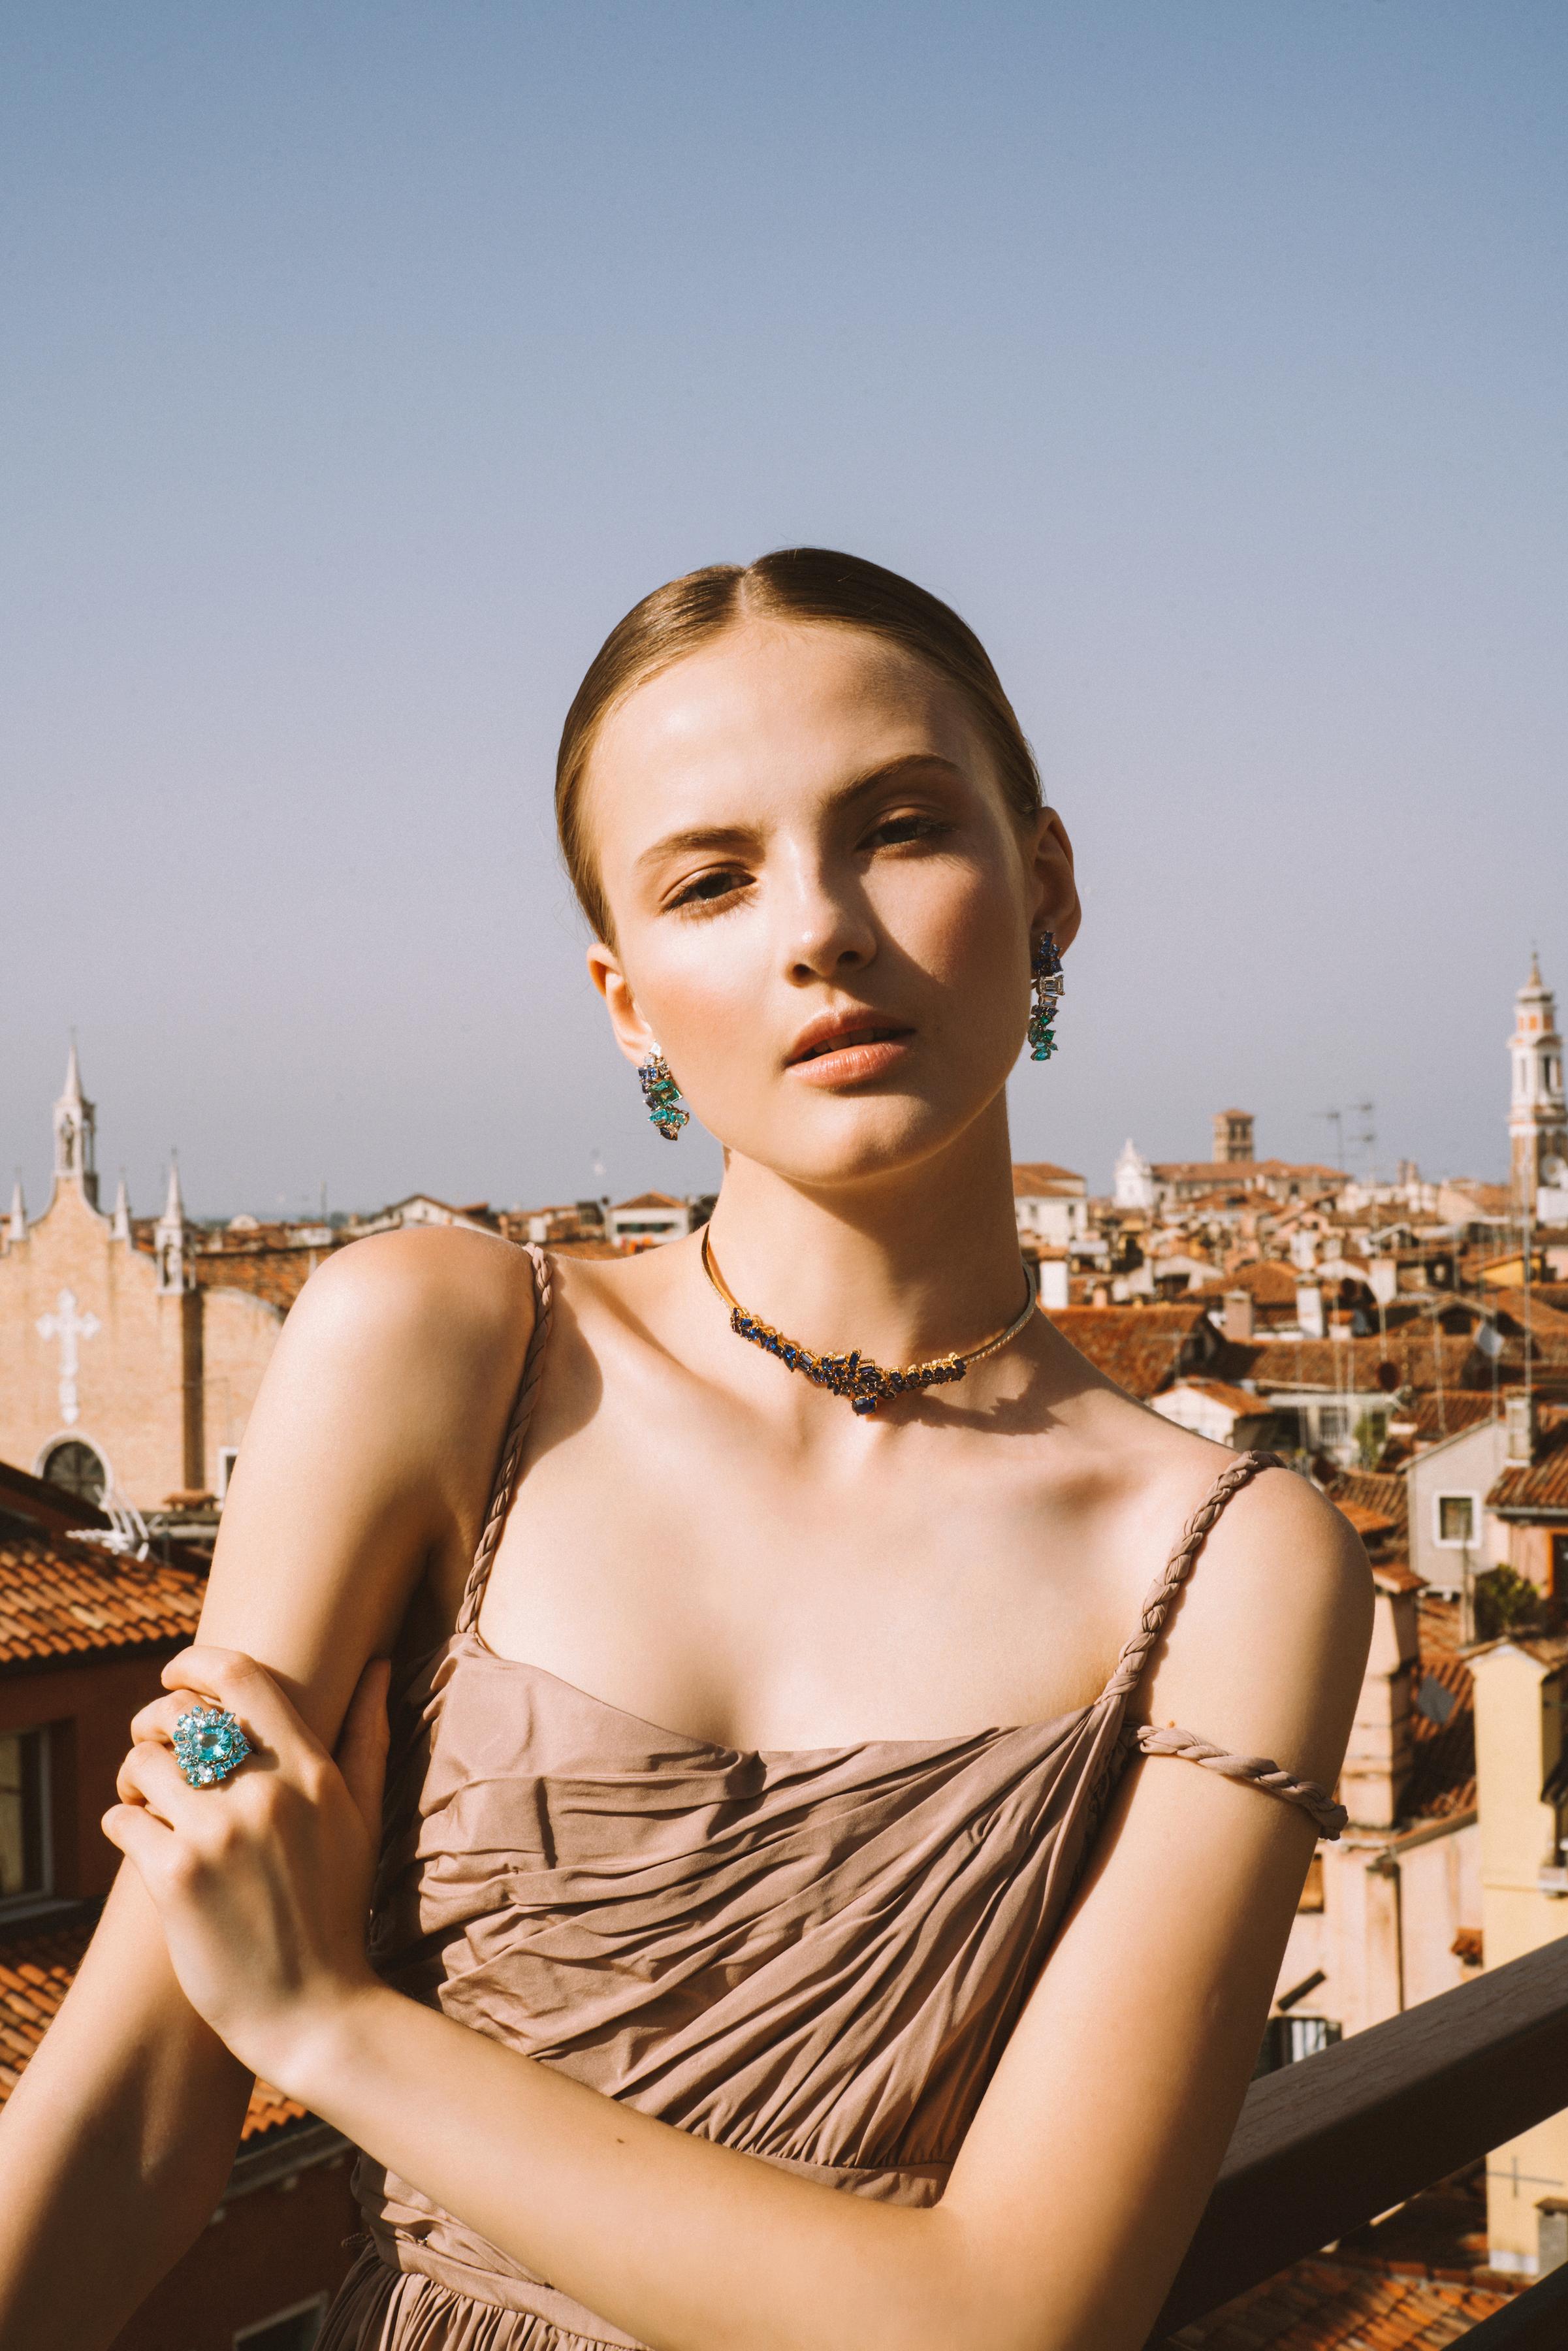 Dior Haute Joaillerie, HKEJ Lifestyle Journal, 2019